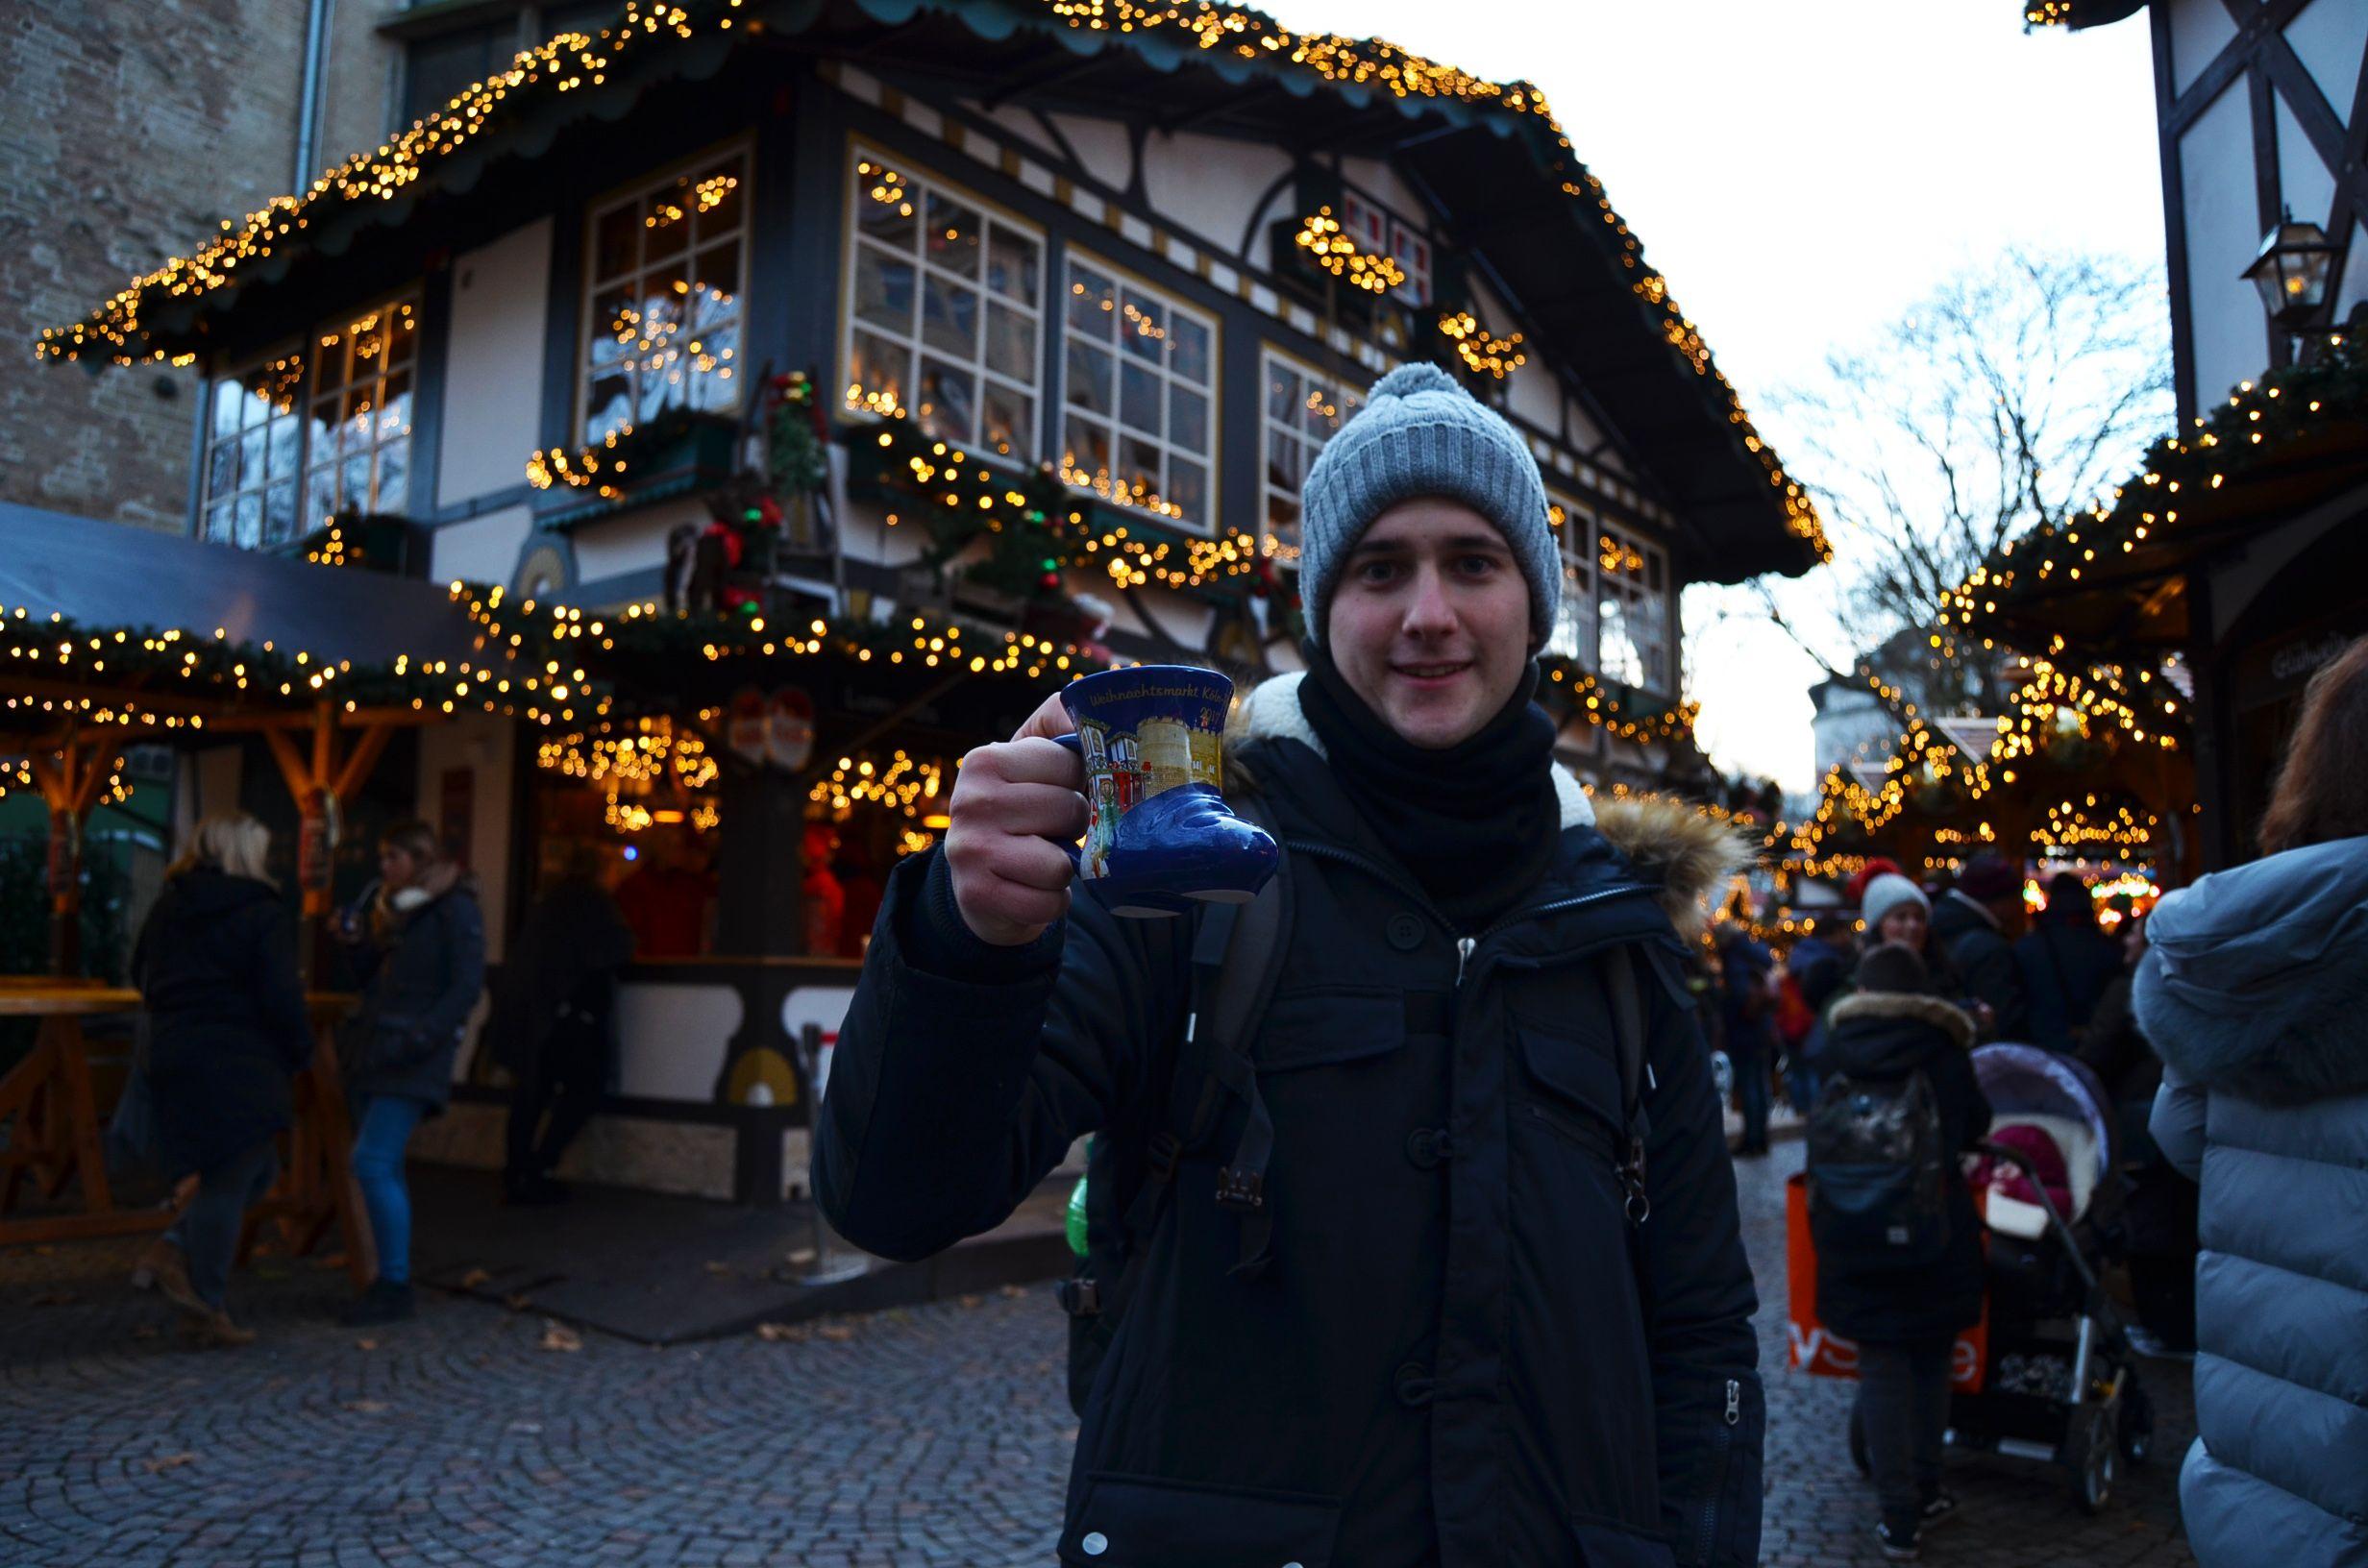 Taza mercado navideño Colonia